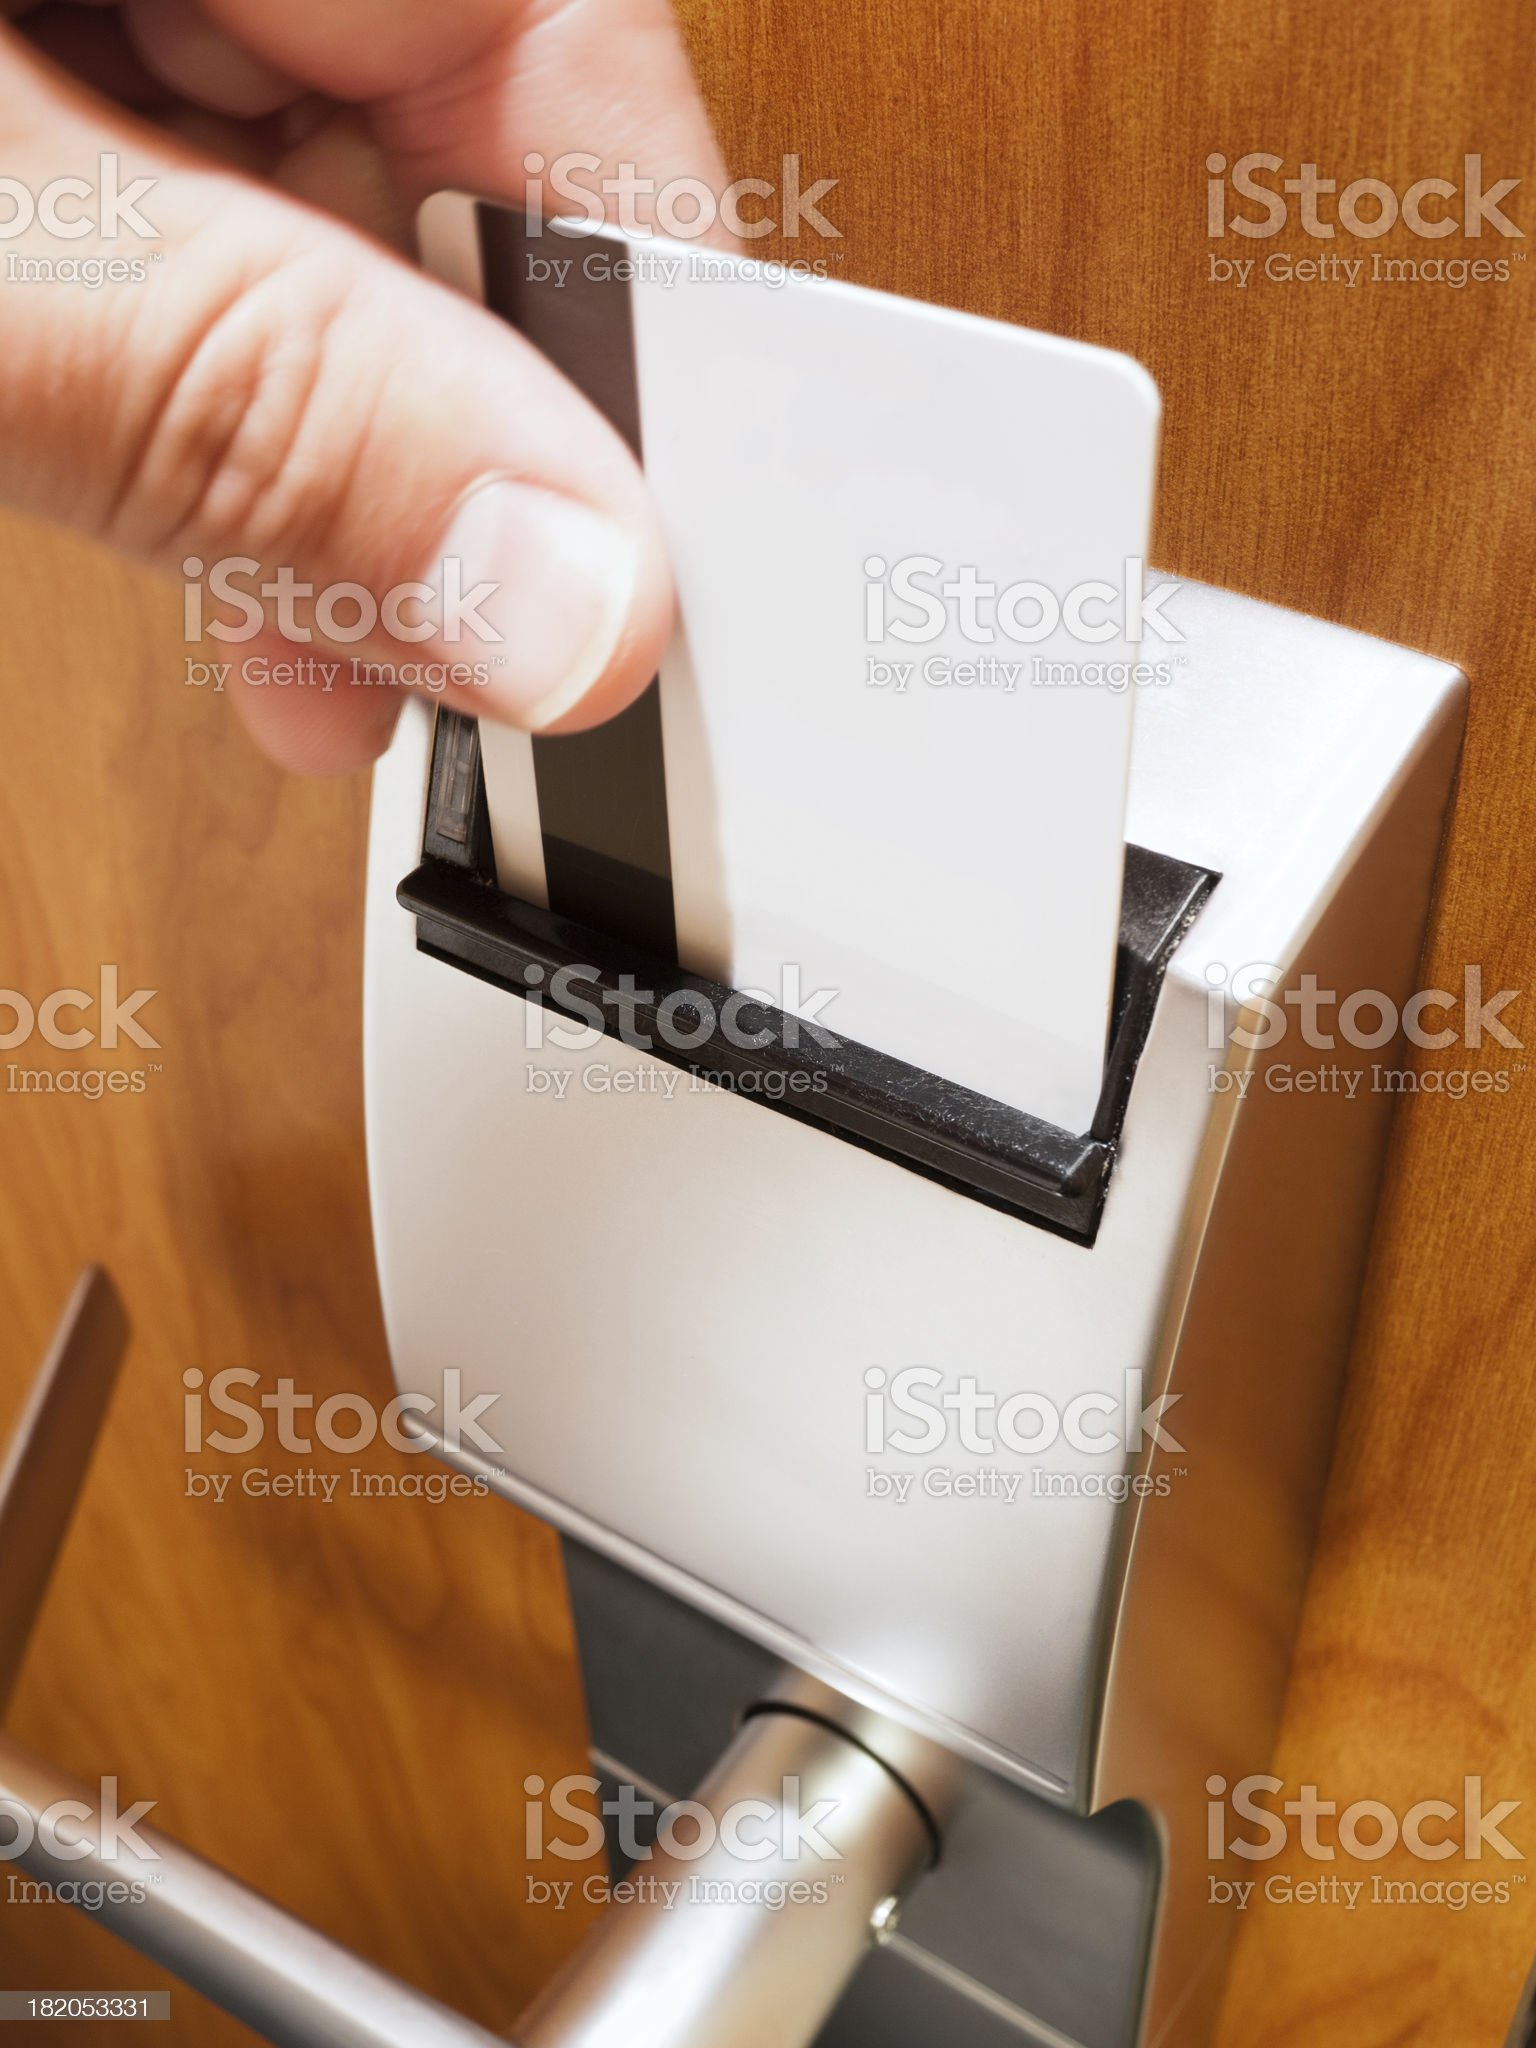 Hotel Room Electronic Door Lock royalty-free stock photo